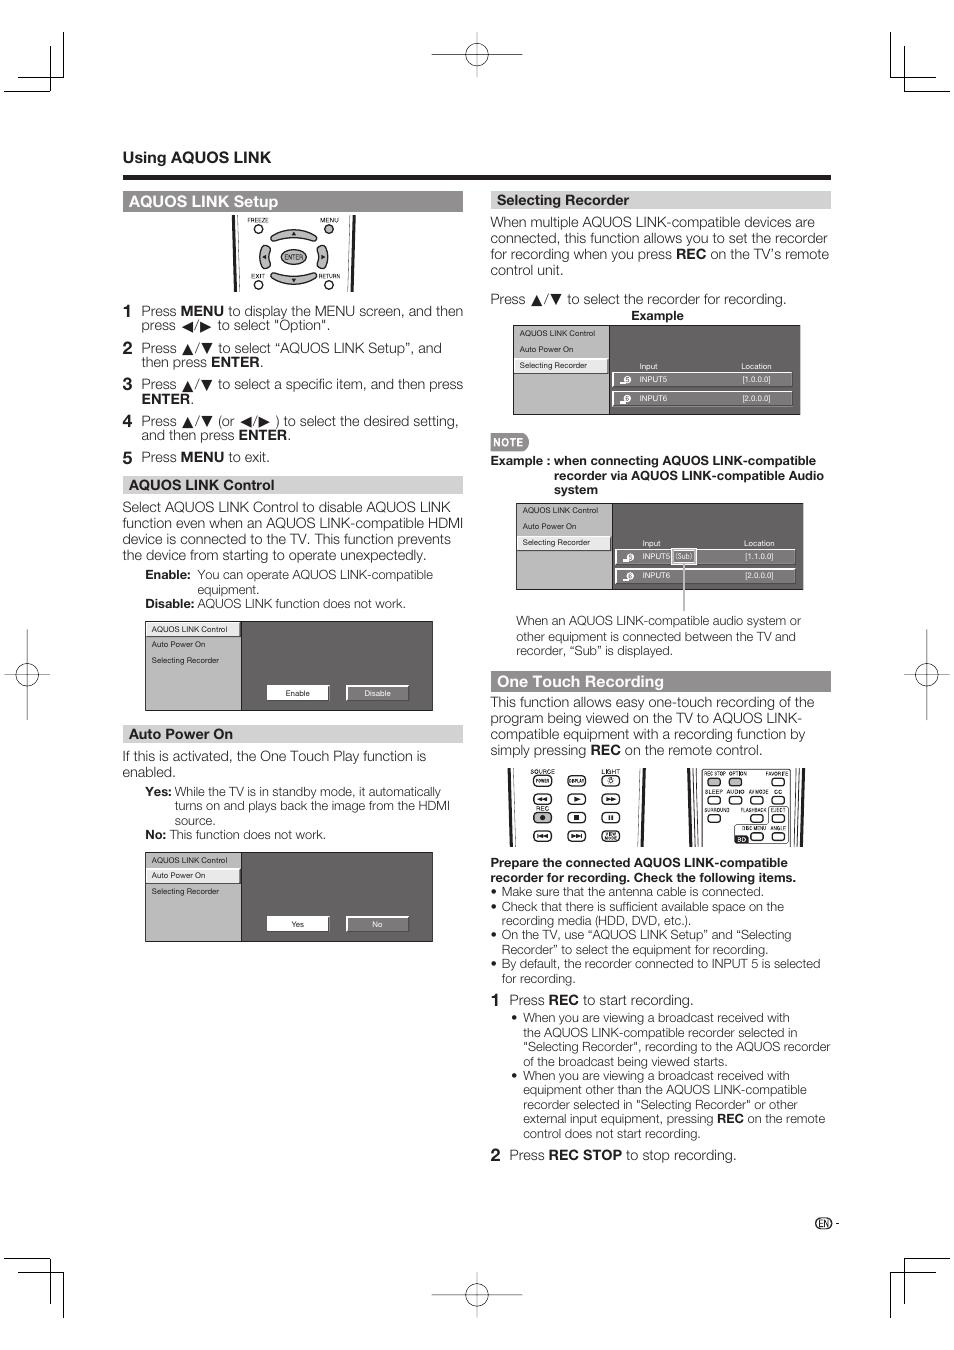 Aquos link setup, Using aquos link, One touch recording